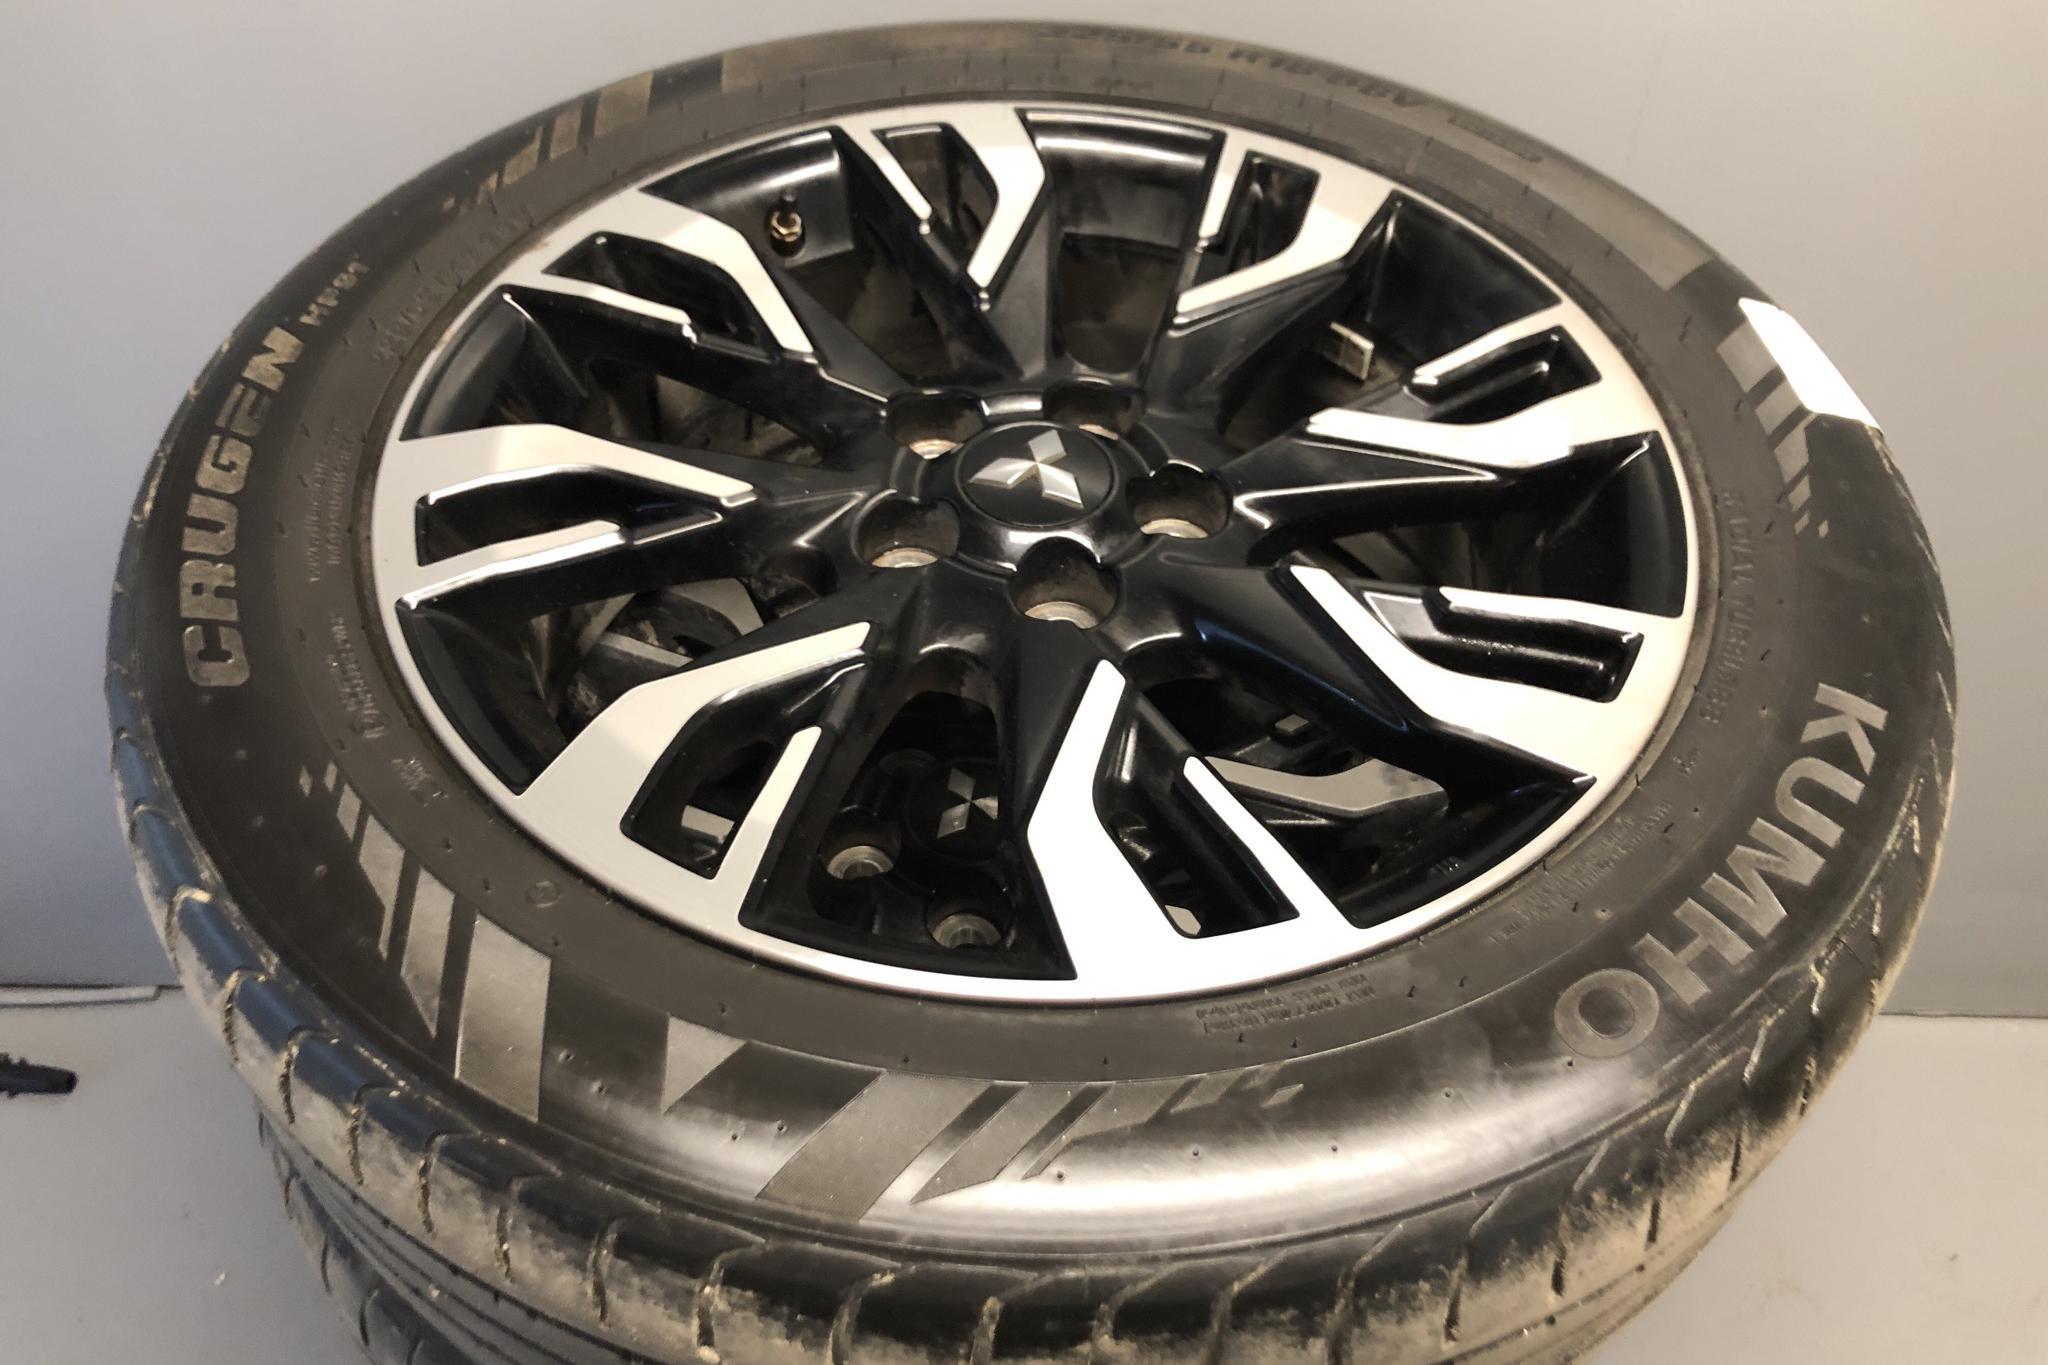 Mitsubishi Outlander 2.0 Plug-in Hybrid 4WD (121hk) - 162 750 km - Automatic - black - 2016